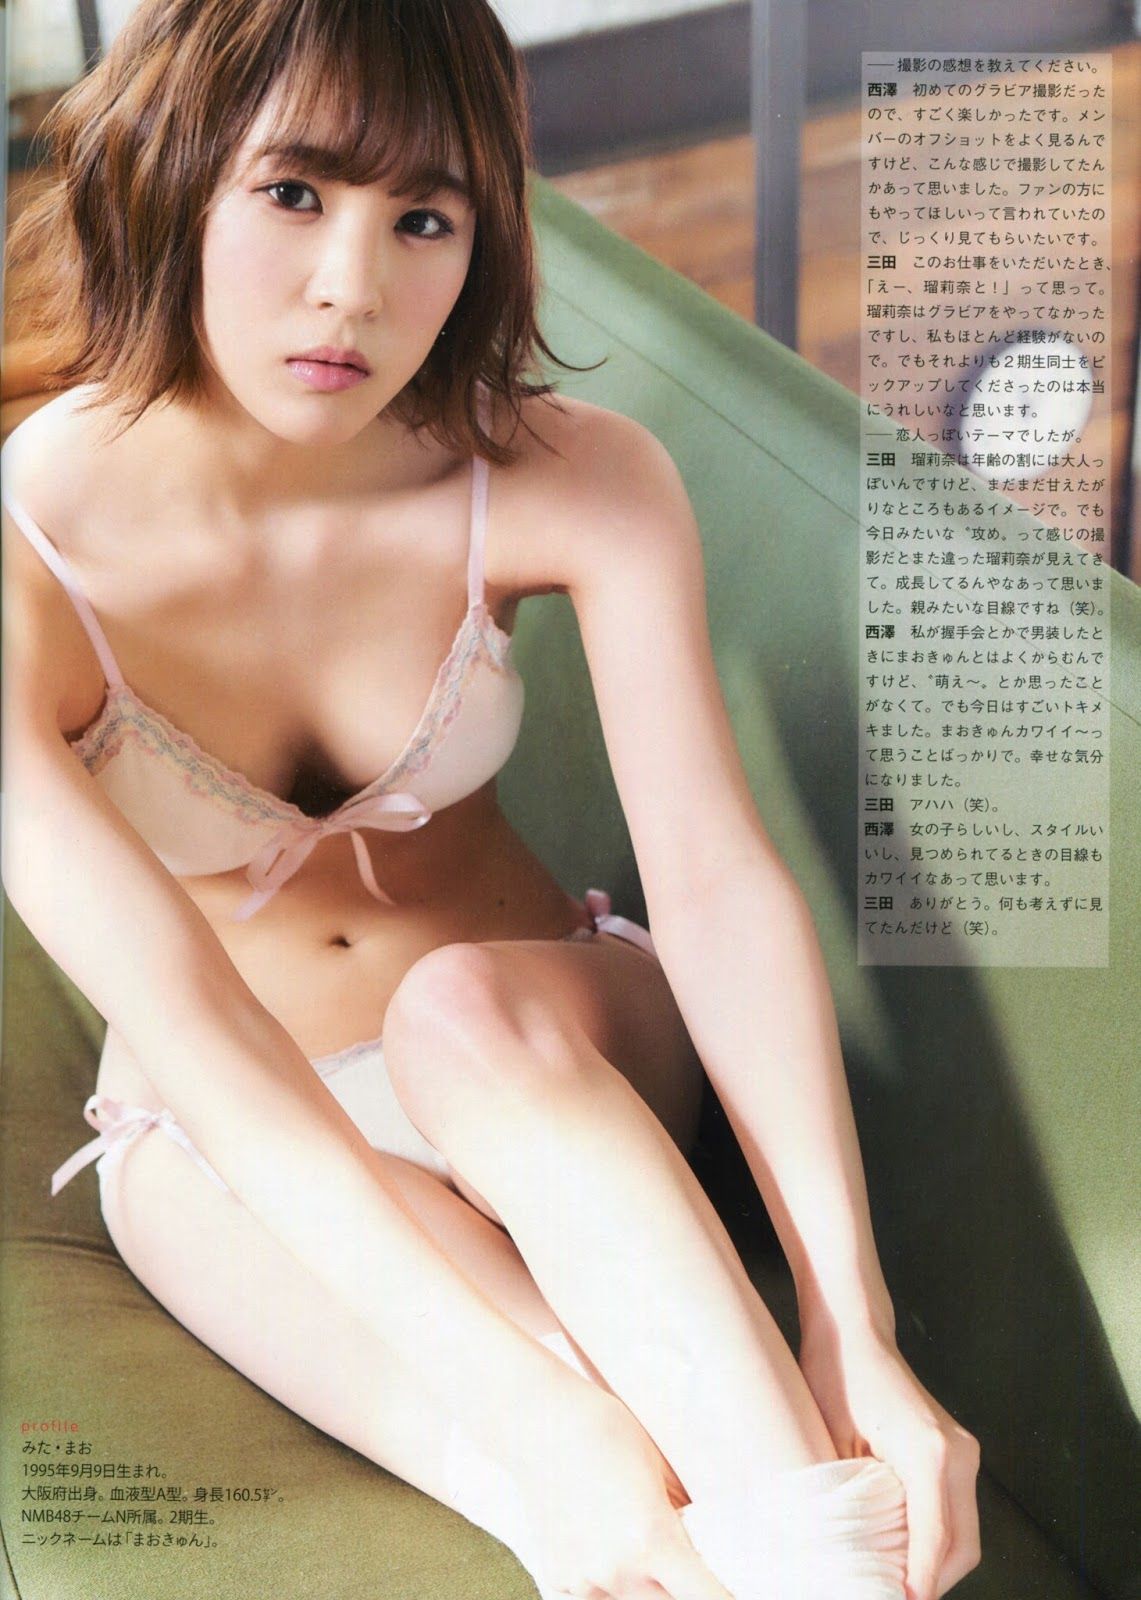 Mita Mao 三田麻央, Nishizawa Rurina 西澤瑠莉奈, ENTAME 2018 No.05 (月刊エンタメ 2018年5月号)